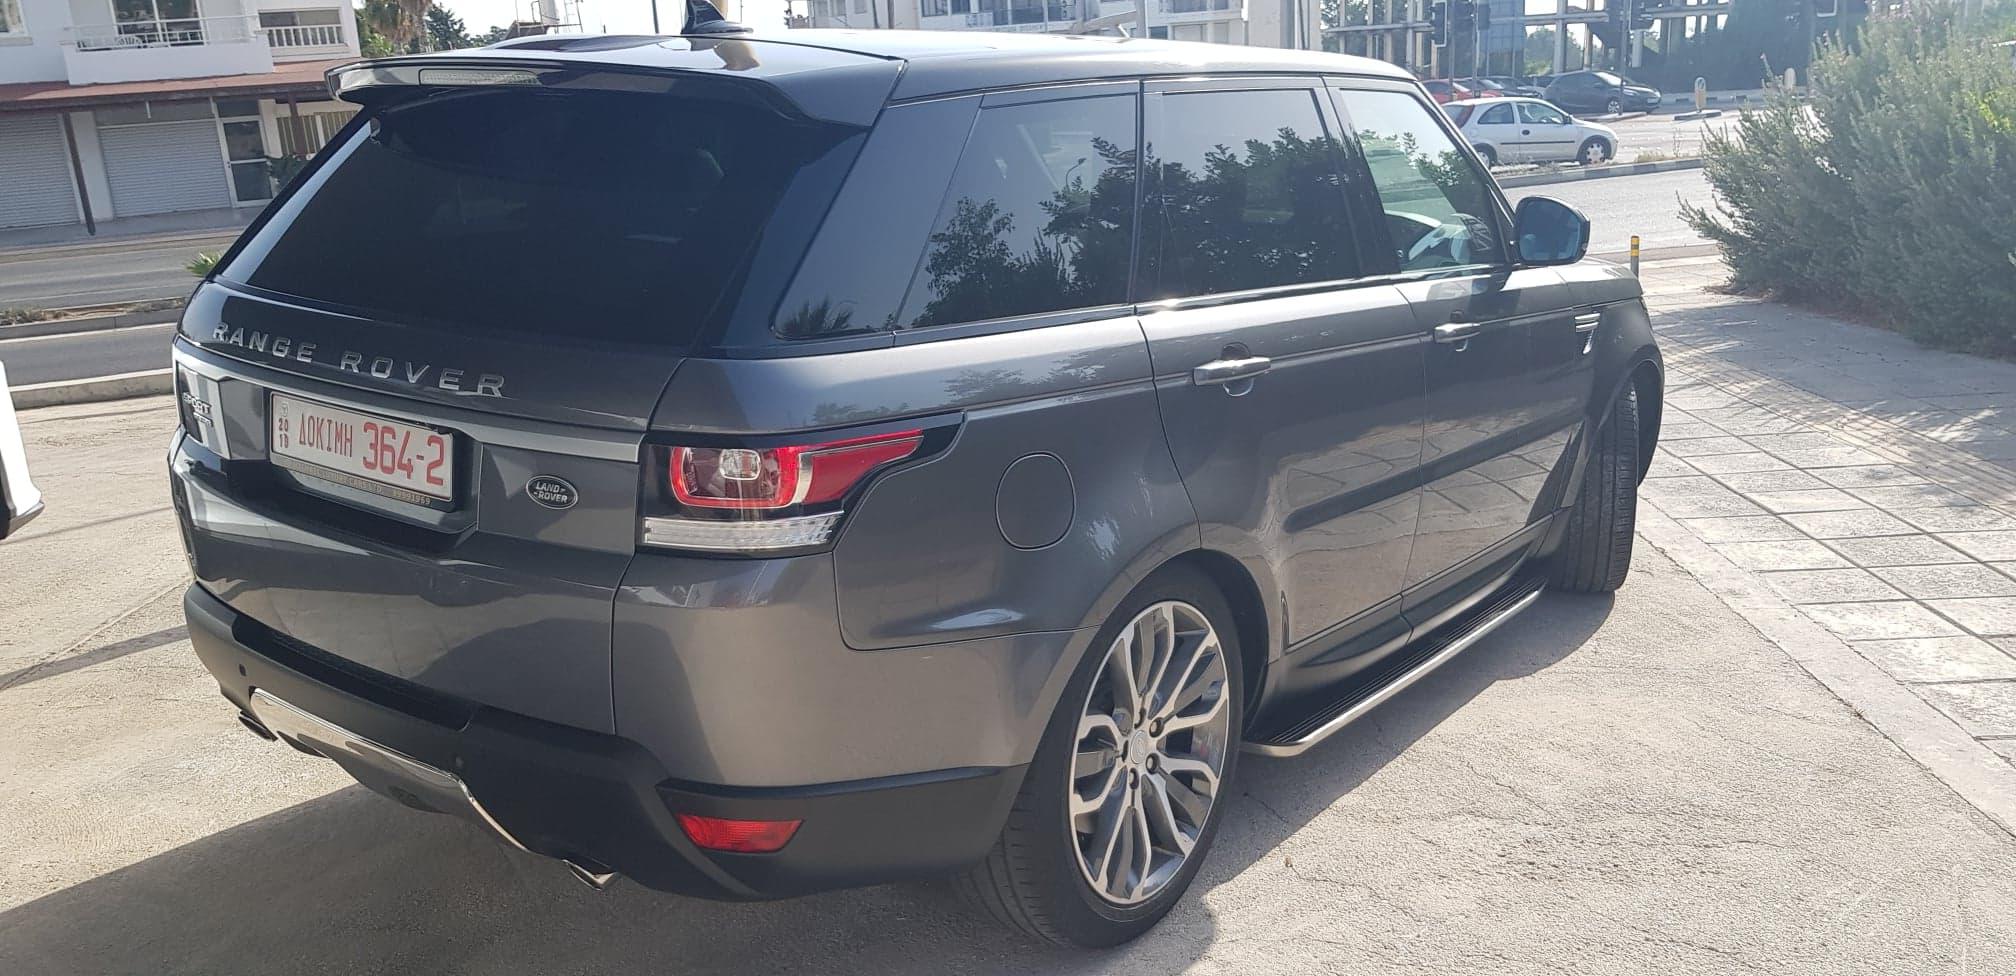 Range Rover Sport 30SD 306 HSE